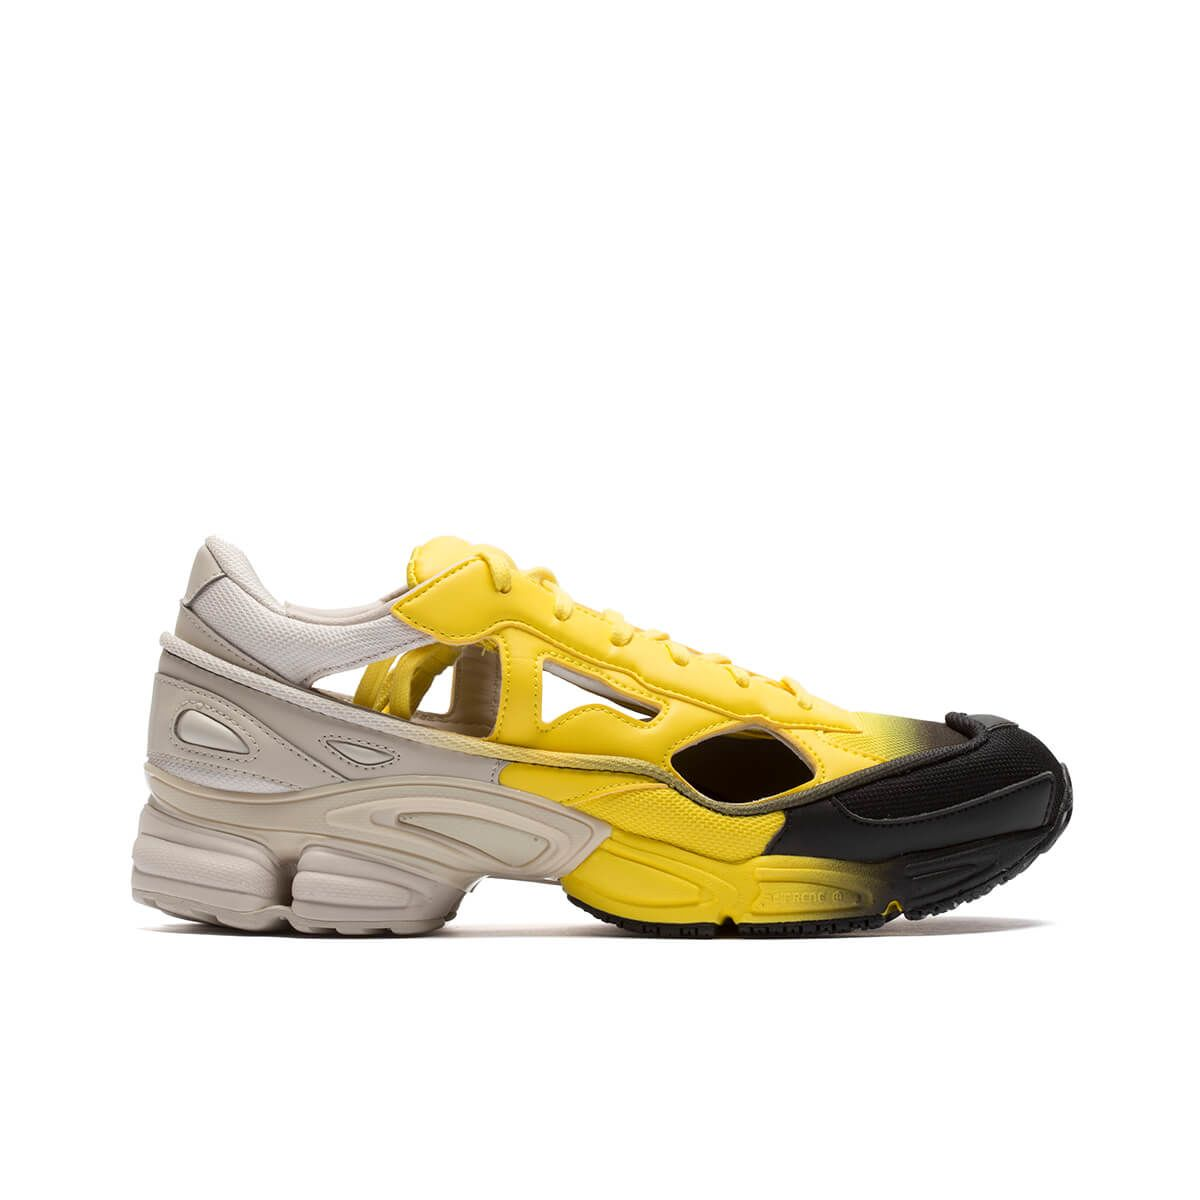 be8ab7b5e Adidas By Raf Simons Adidas By Raf Simons Replicant Ozweego Sneakers ...